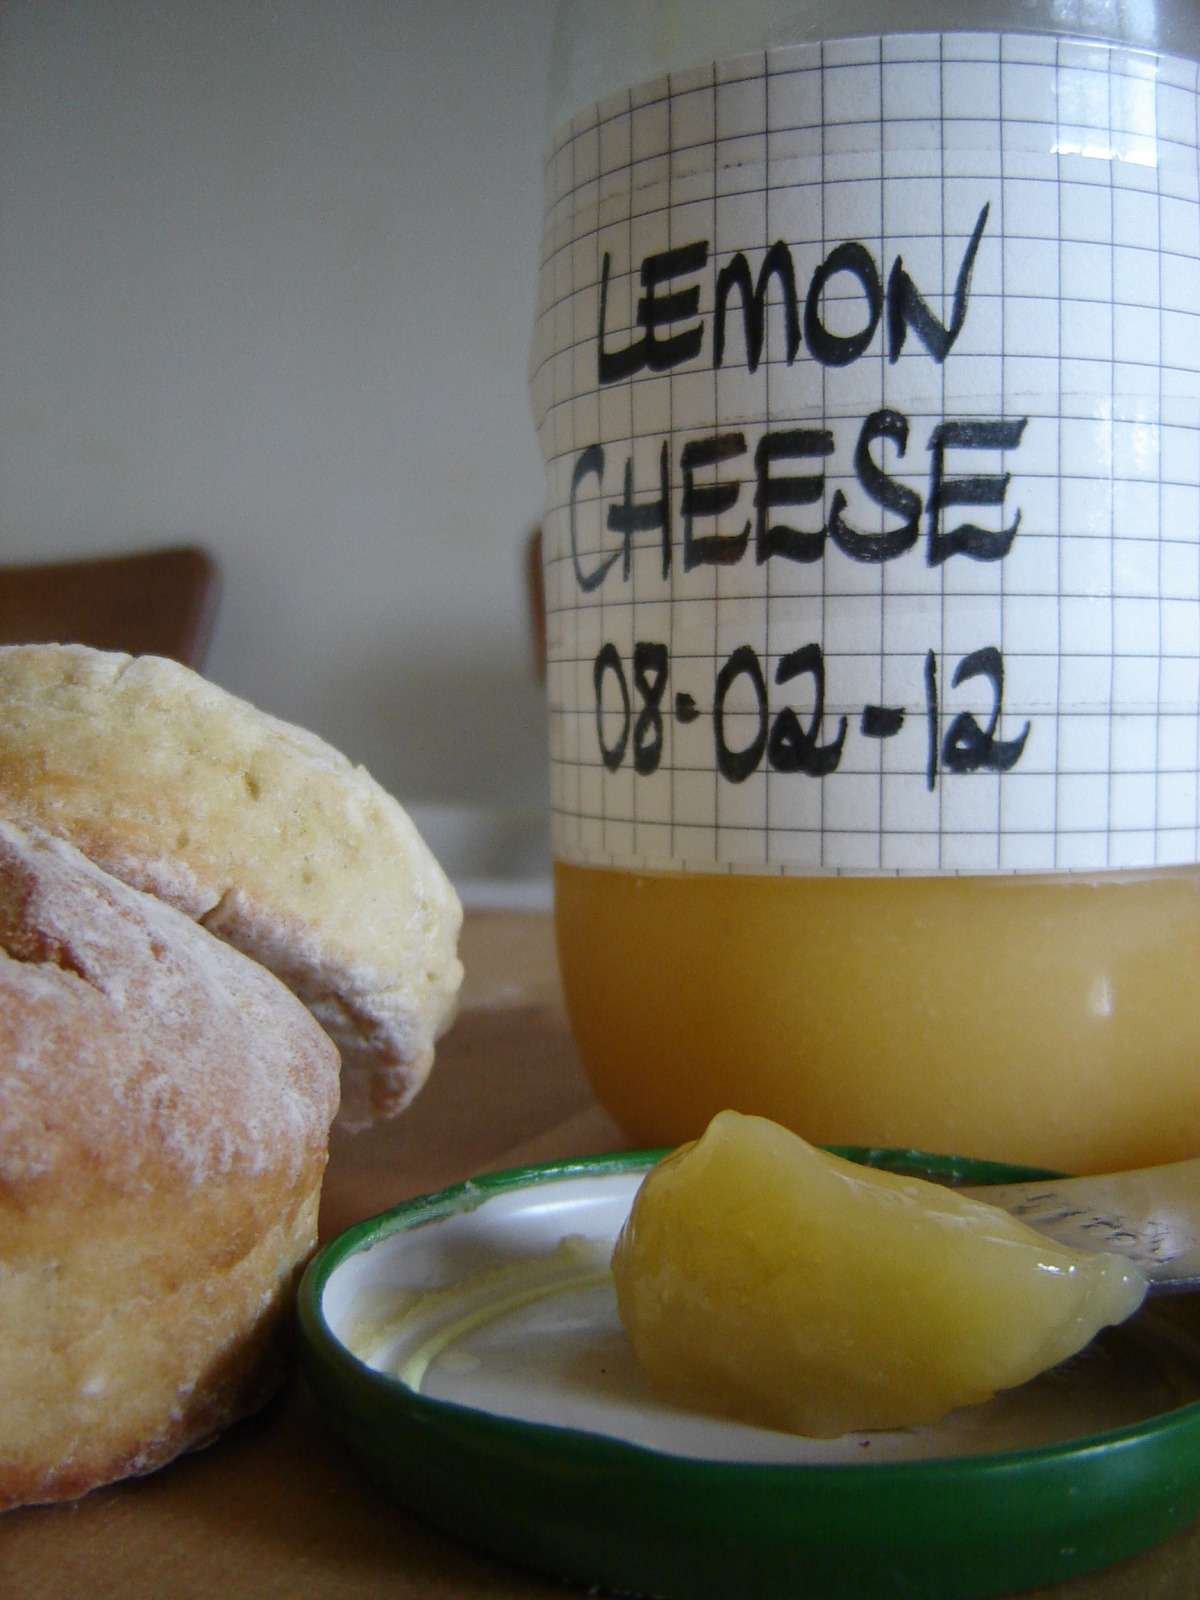 Lemon Cheese image